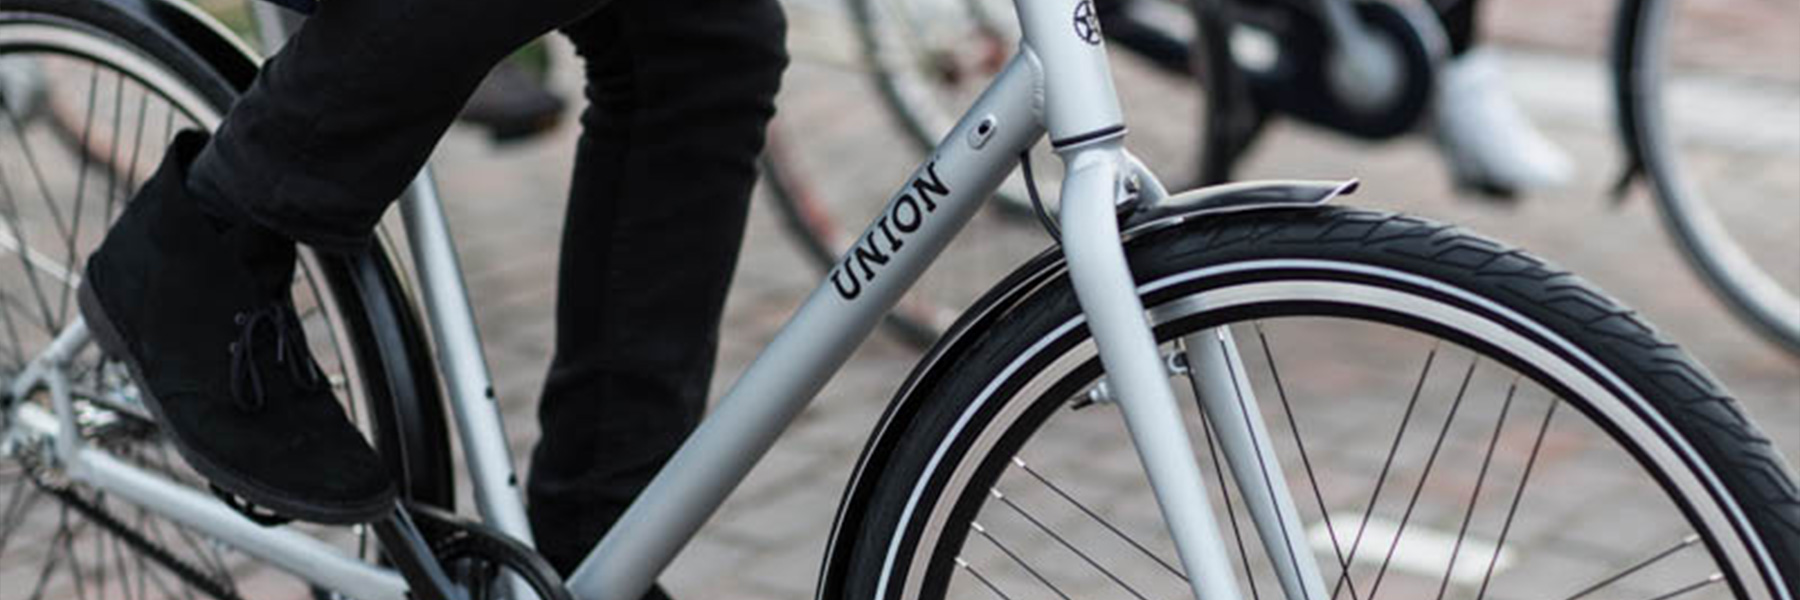 Close up riemaandrijving Union fiets